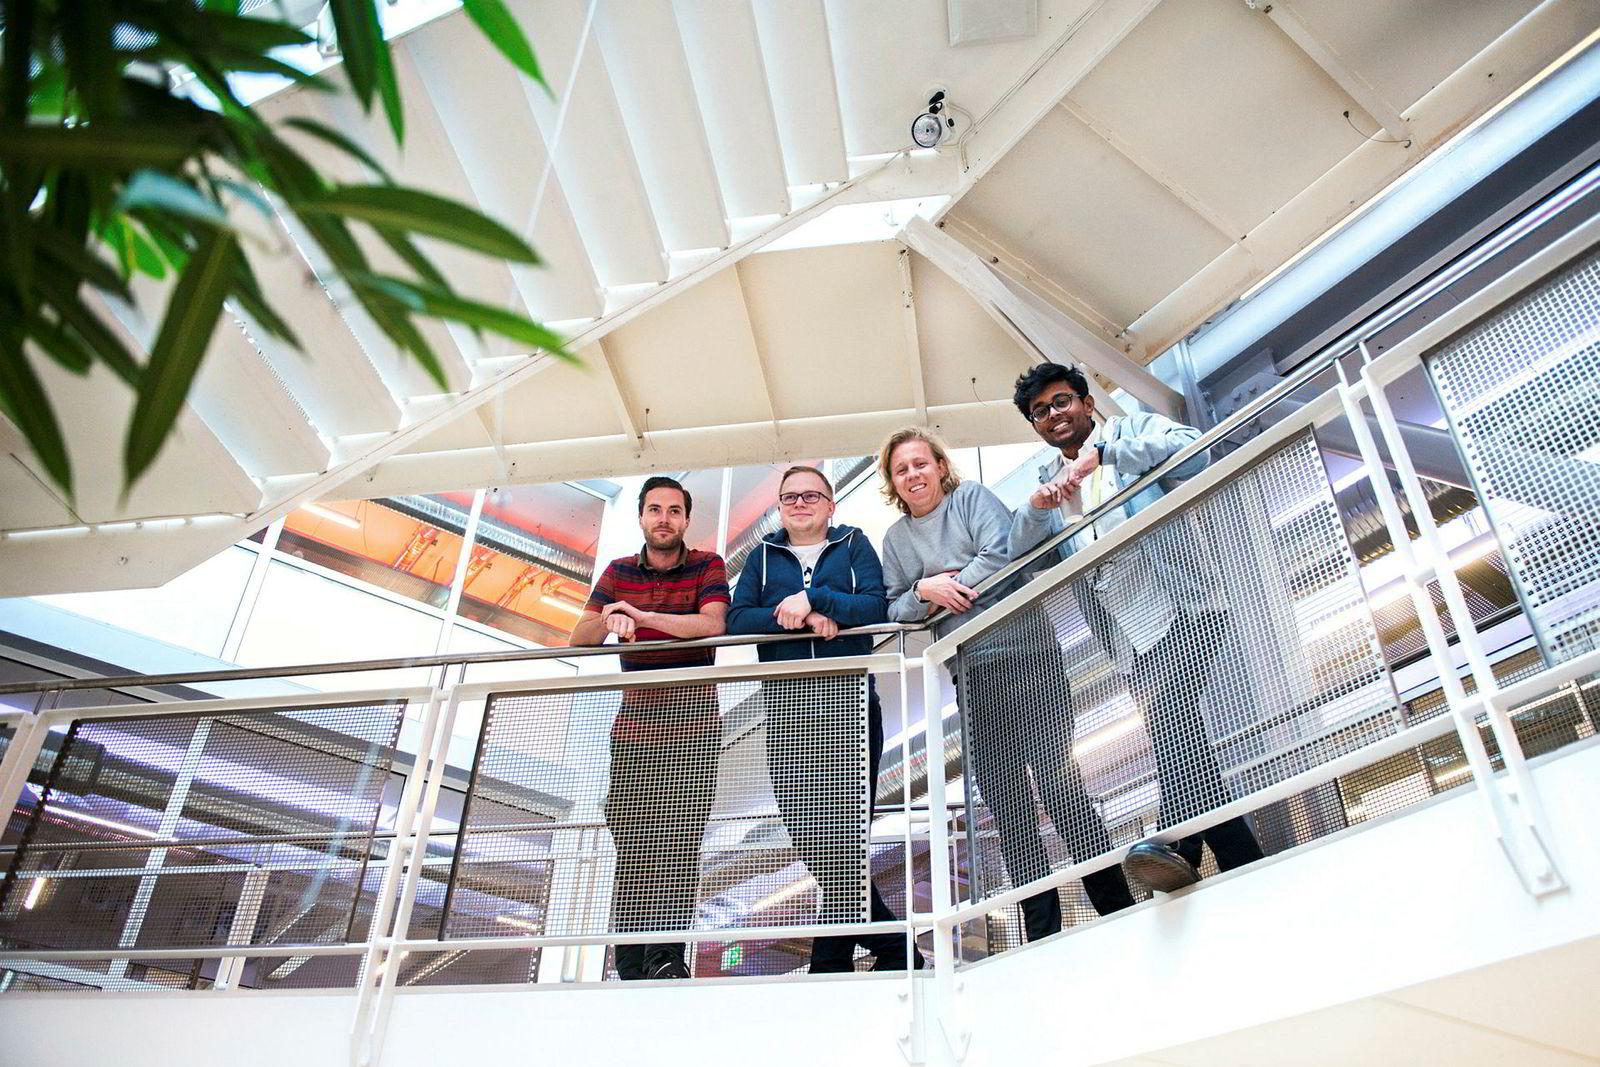 Fra venstre: CTO Ole Nordviste, Michal Pietrzyk, CFO CEO Maths Mathisen og Vinoth Vinaya satser stort.